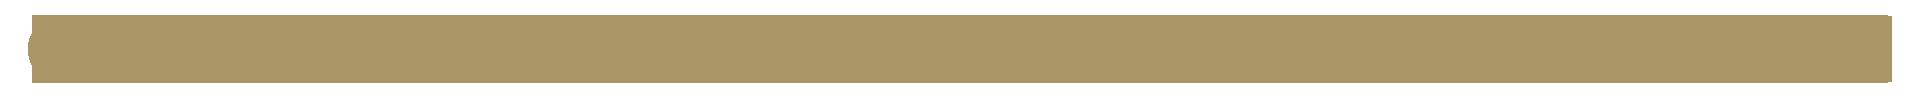 Thistle Windows & Conservatories: Over 97% Customer Satisfaction